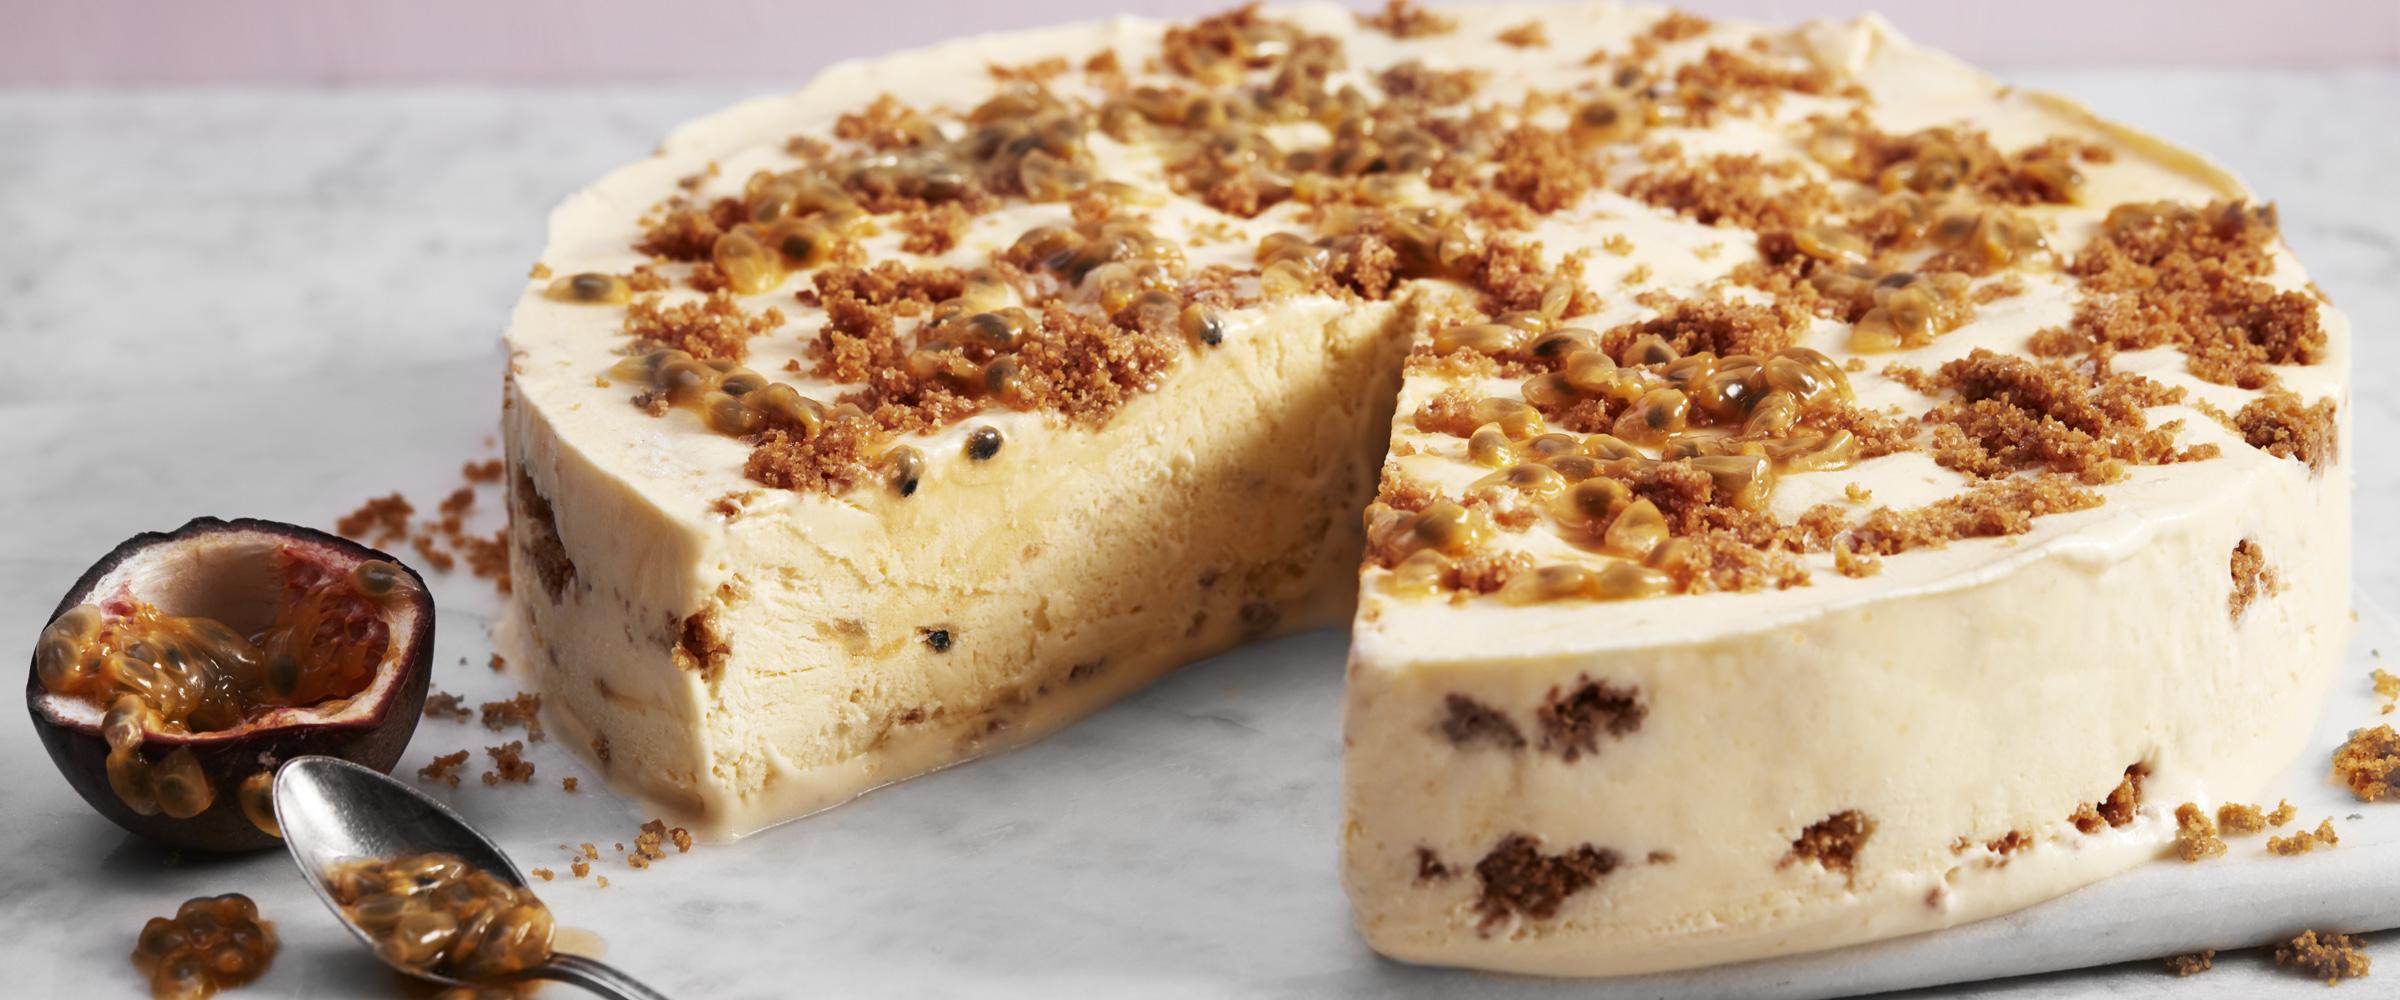 cheesecake utan ugn